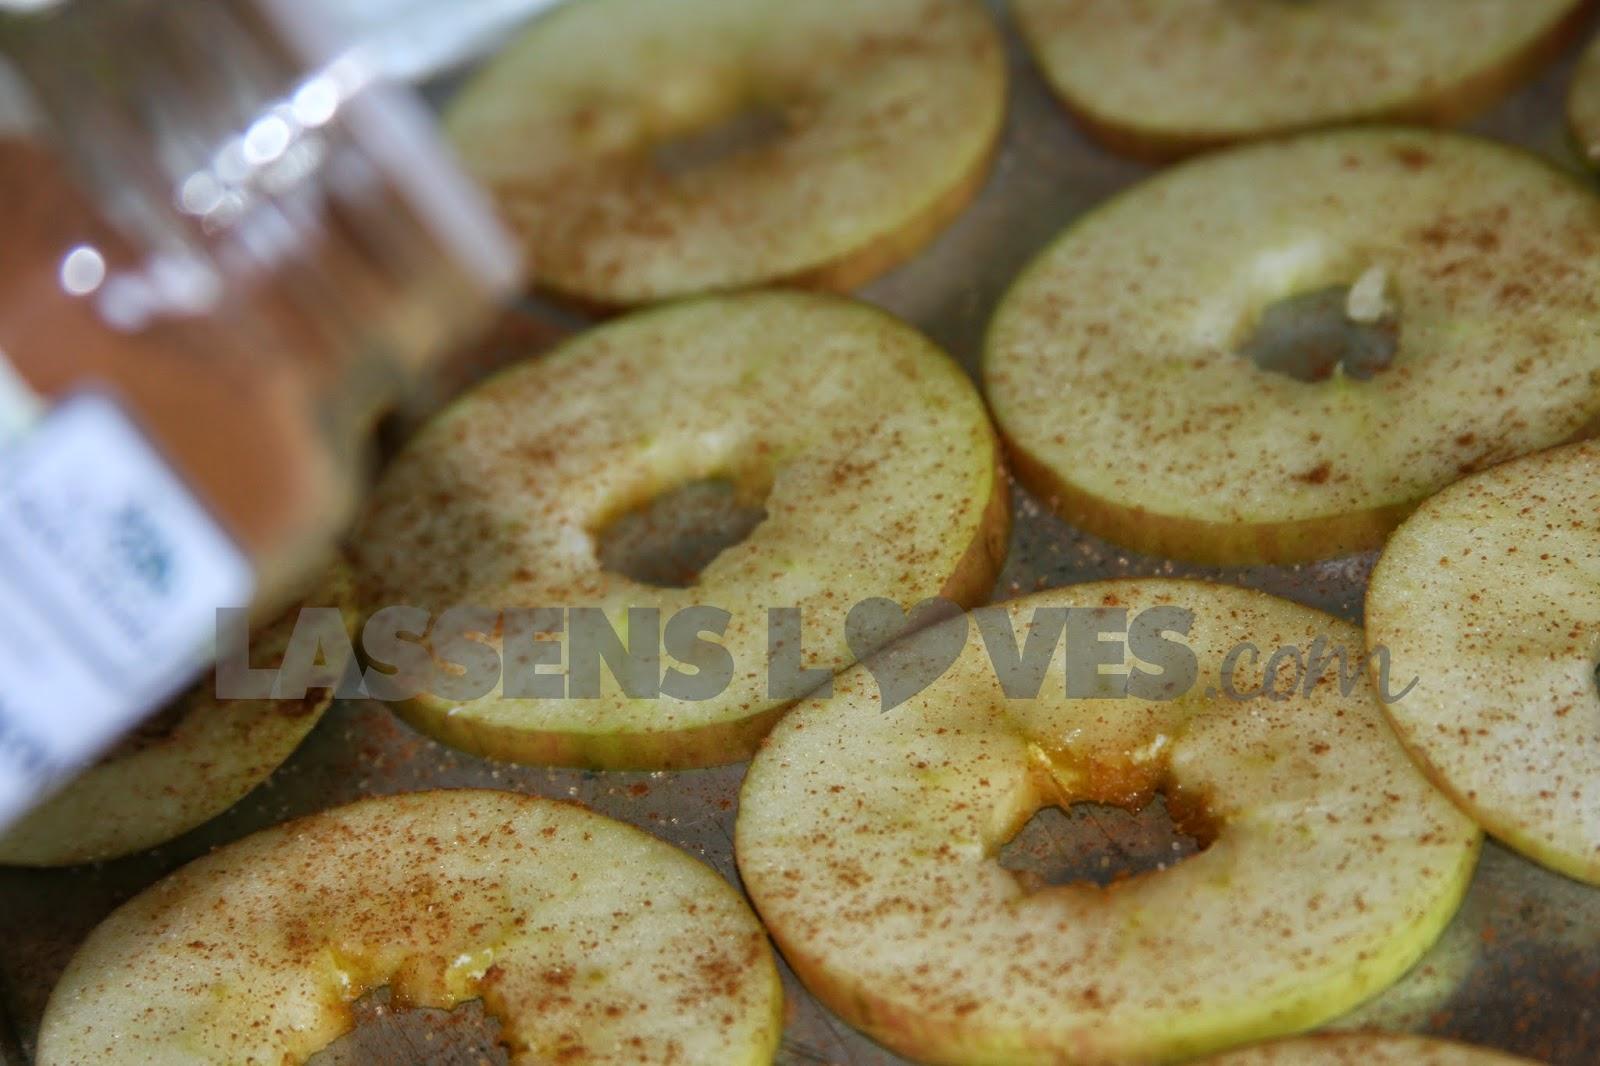 dried+apples, apple+chips, cinnamon+apples